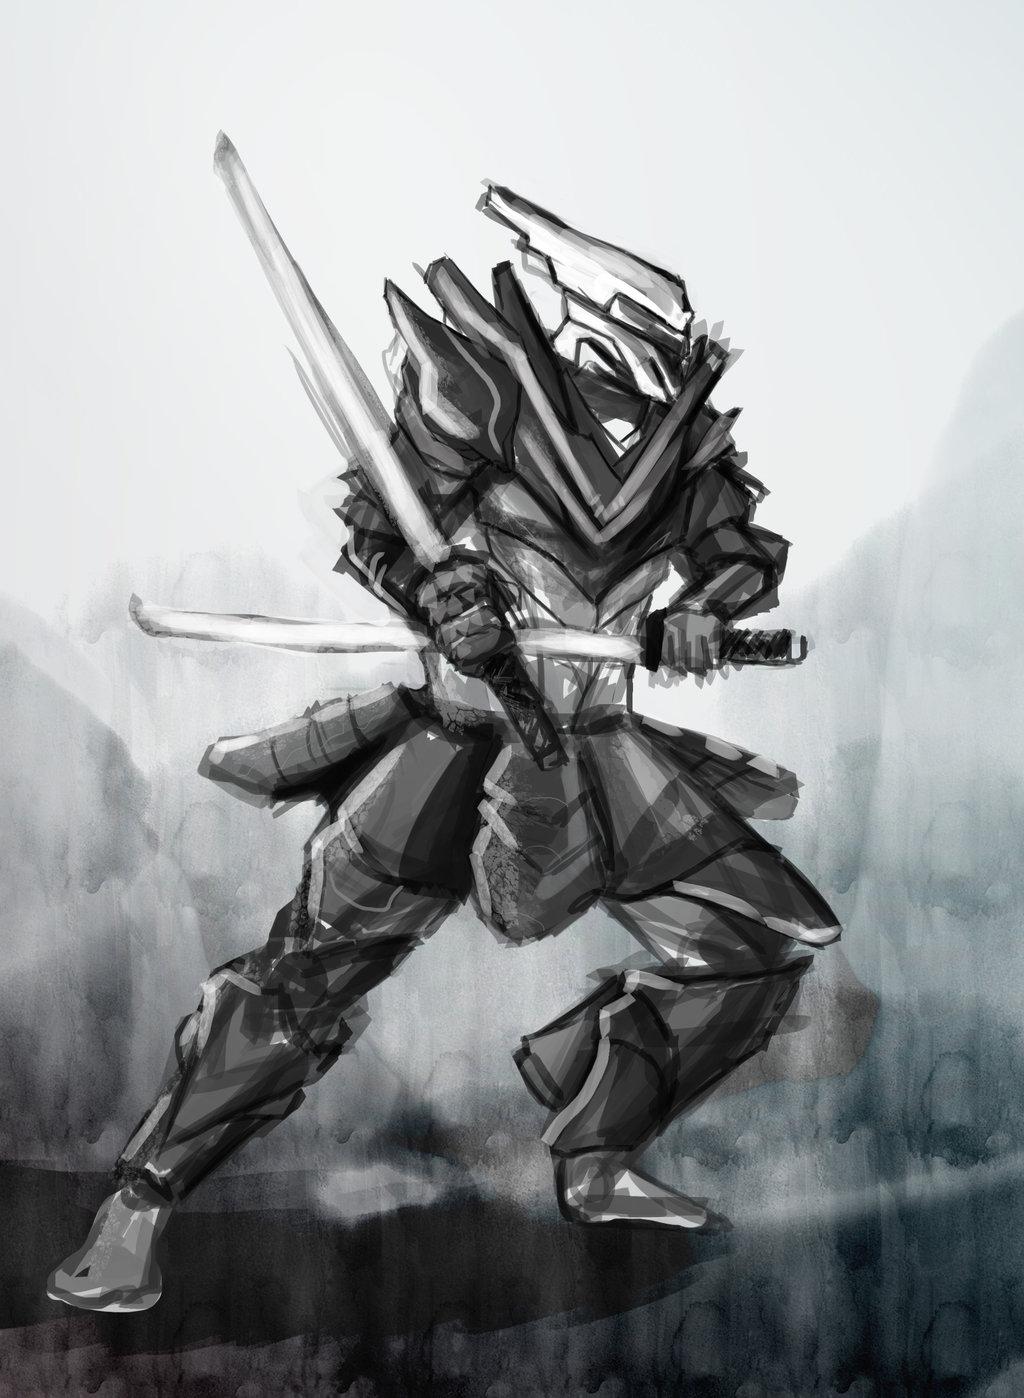 Drawn samurai robot samurai NihoAme Samurai on NihoAme Samurai